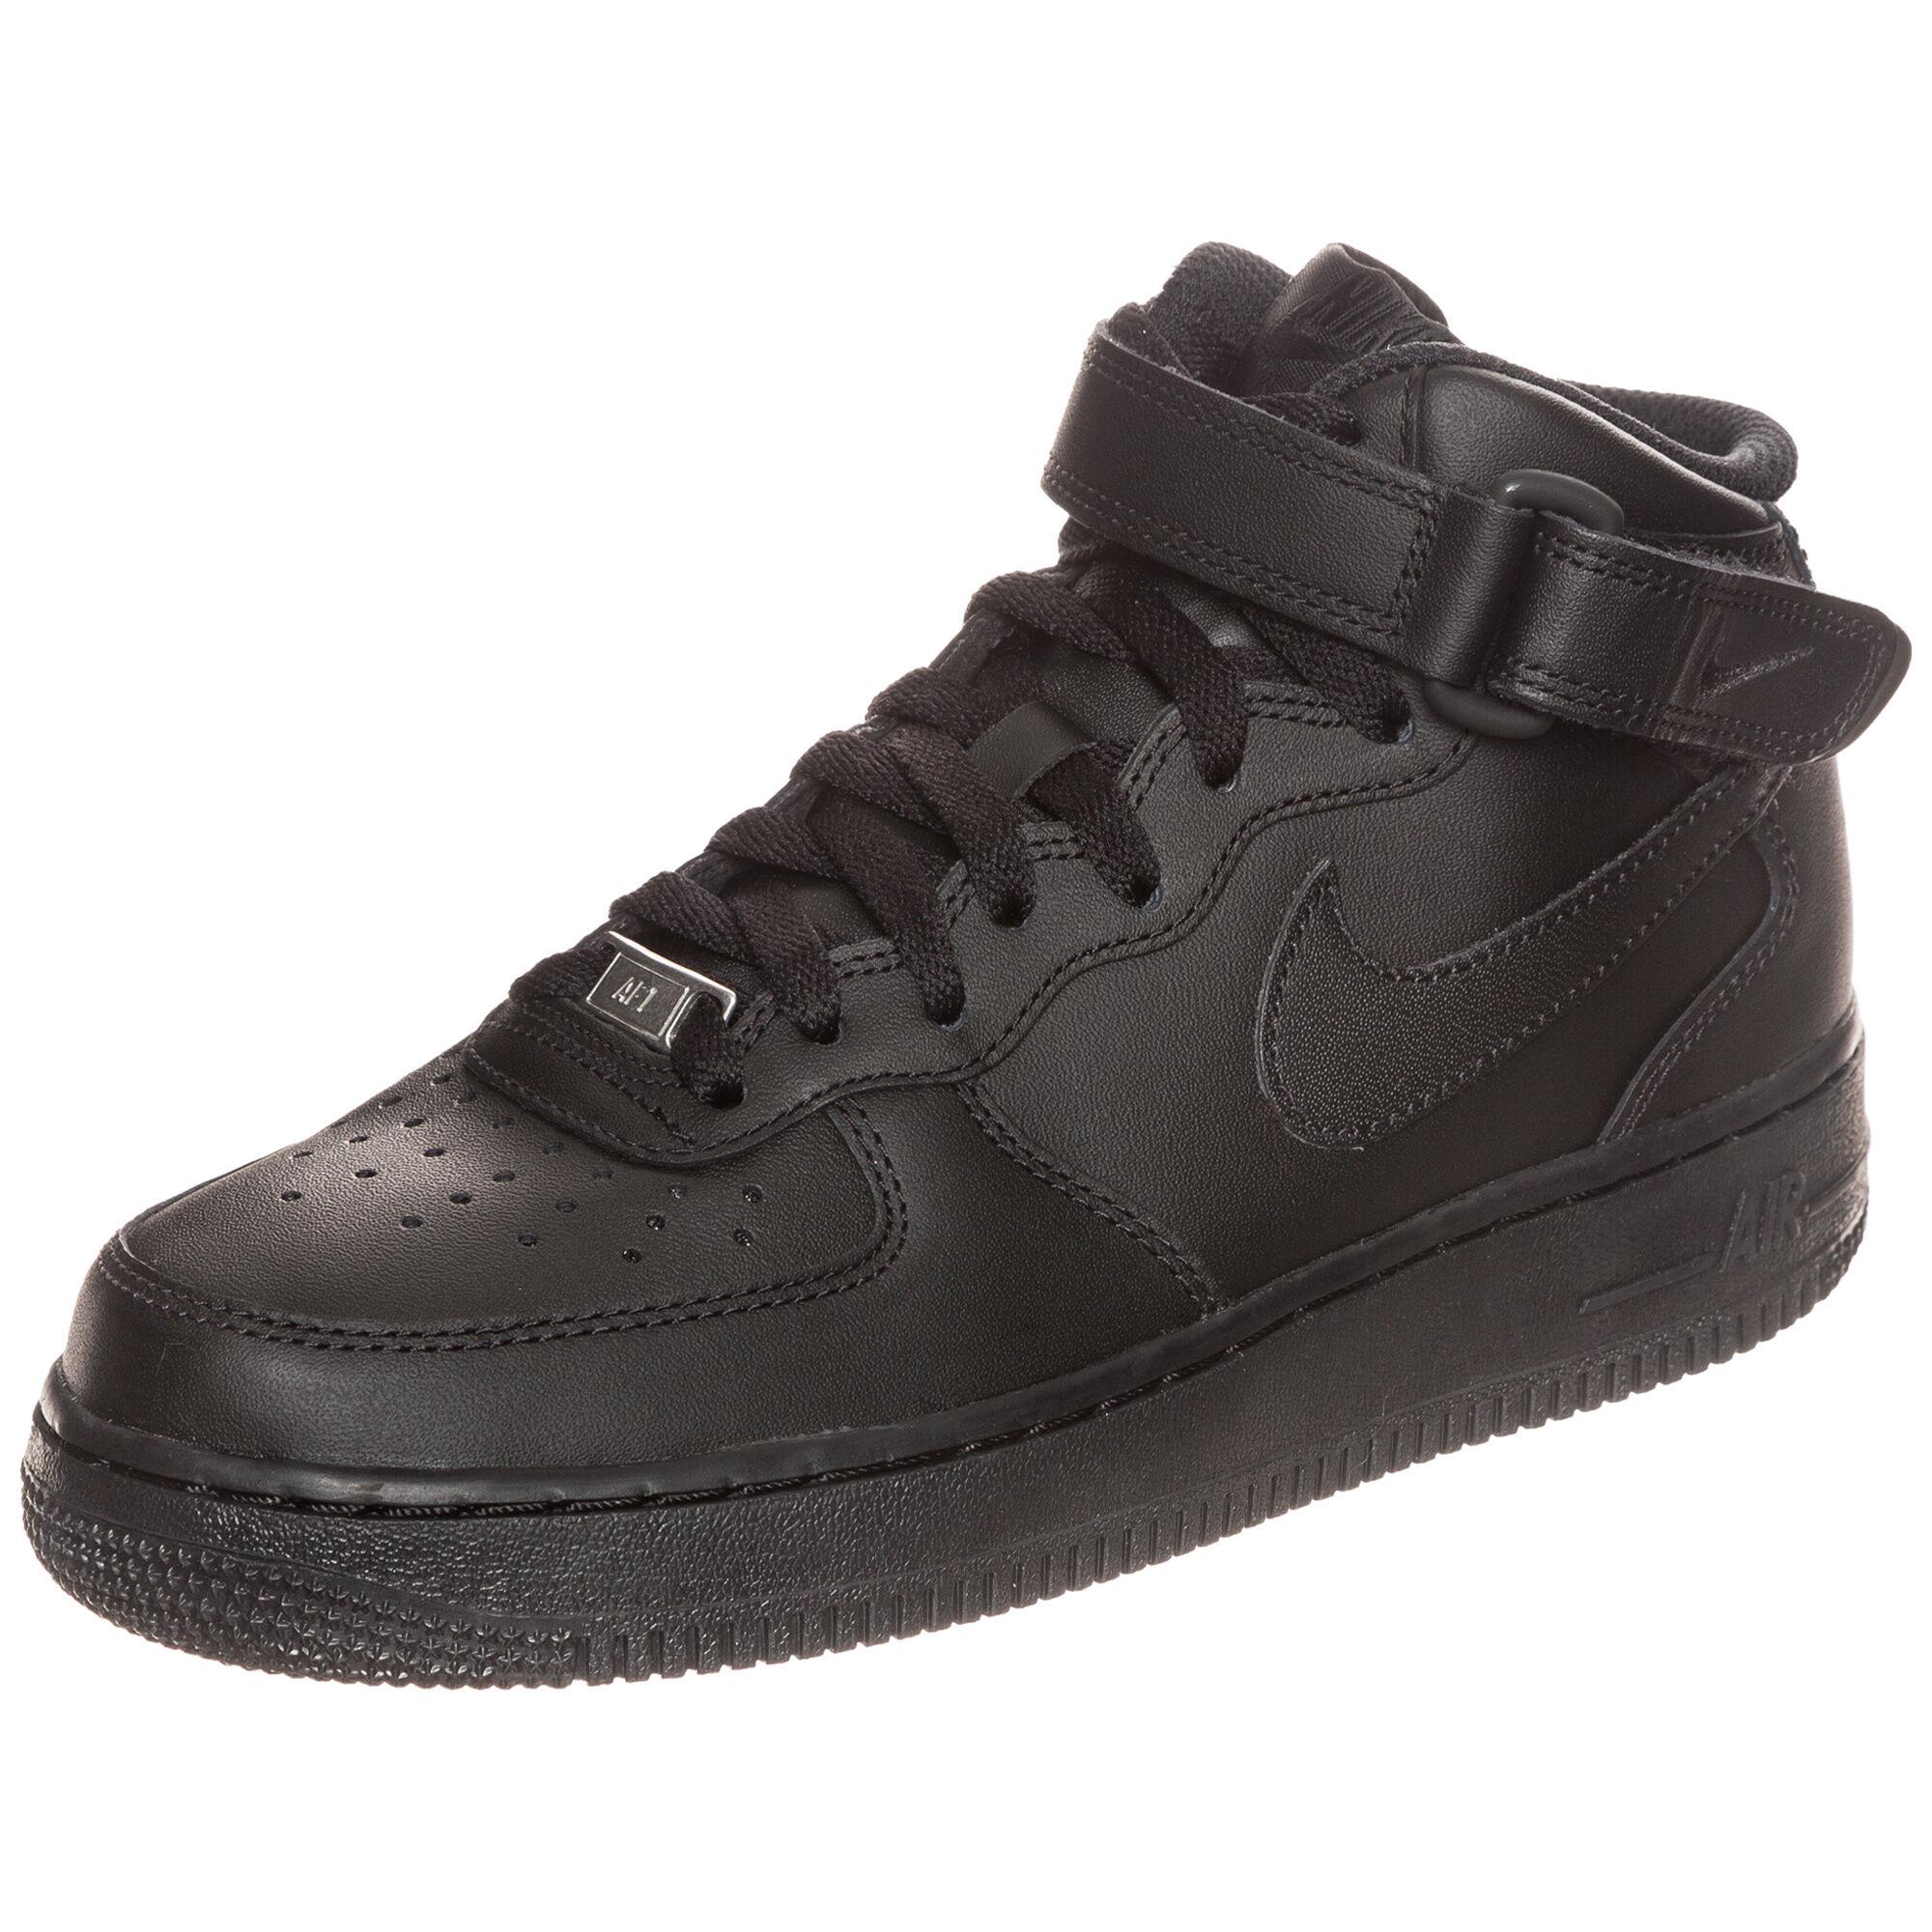 sale retailer 29bf9 e7e83 ... Socfly SD 3.0 Damen Running Schuhe Rosa Weiß Logo On B73y7841,. NikeAir  Force 1 Mid 2007 SneakerDamen schwarz